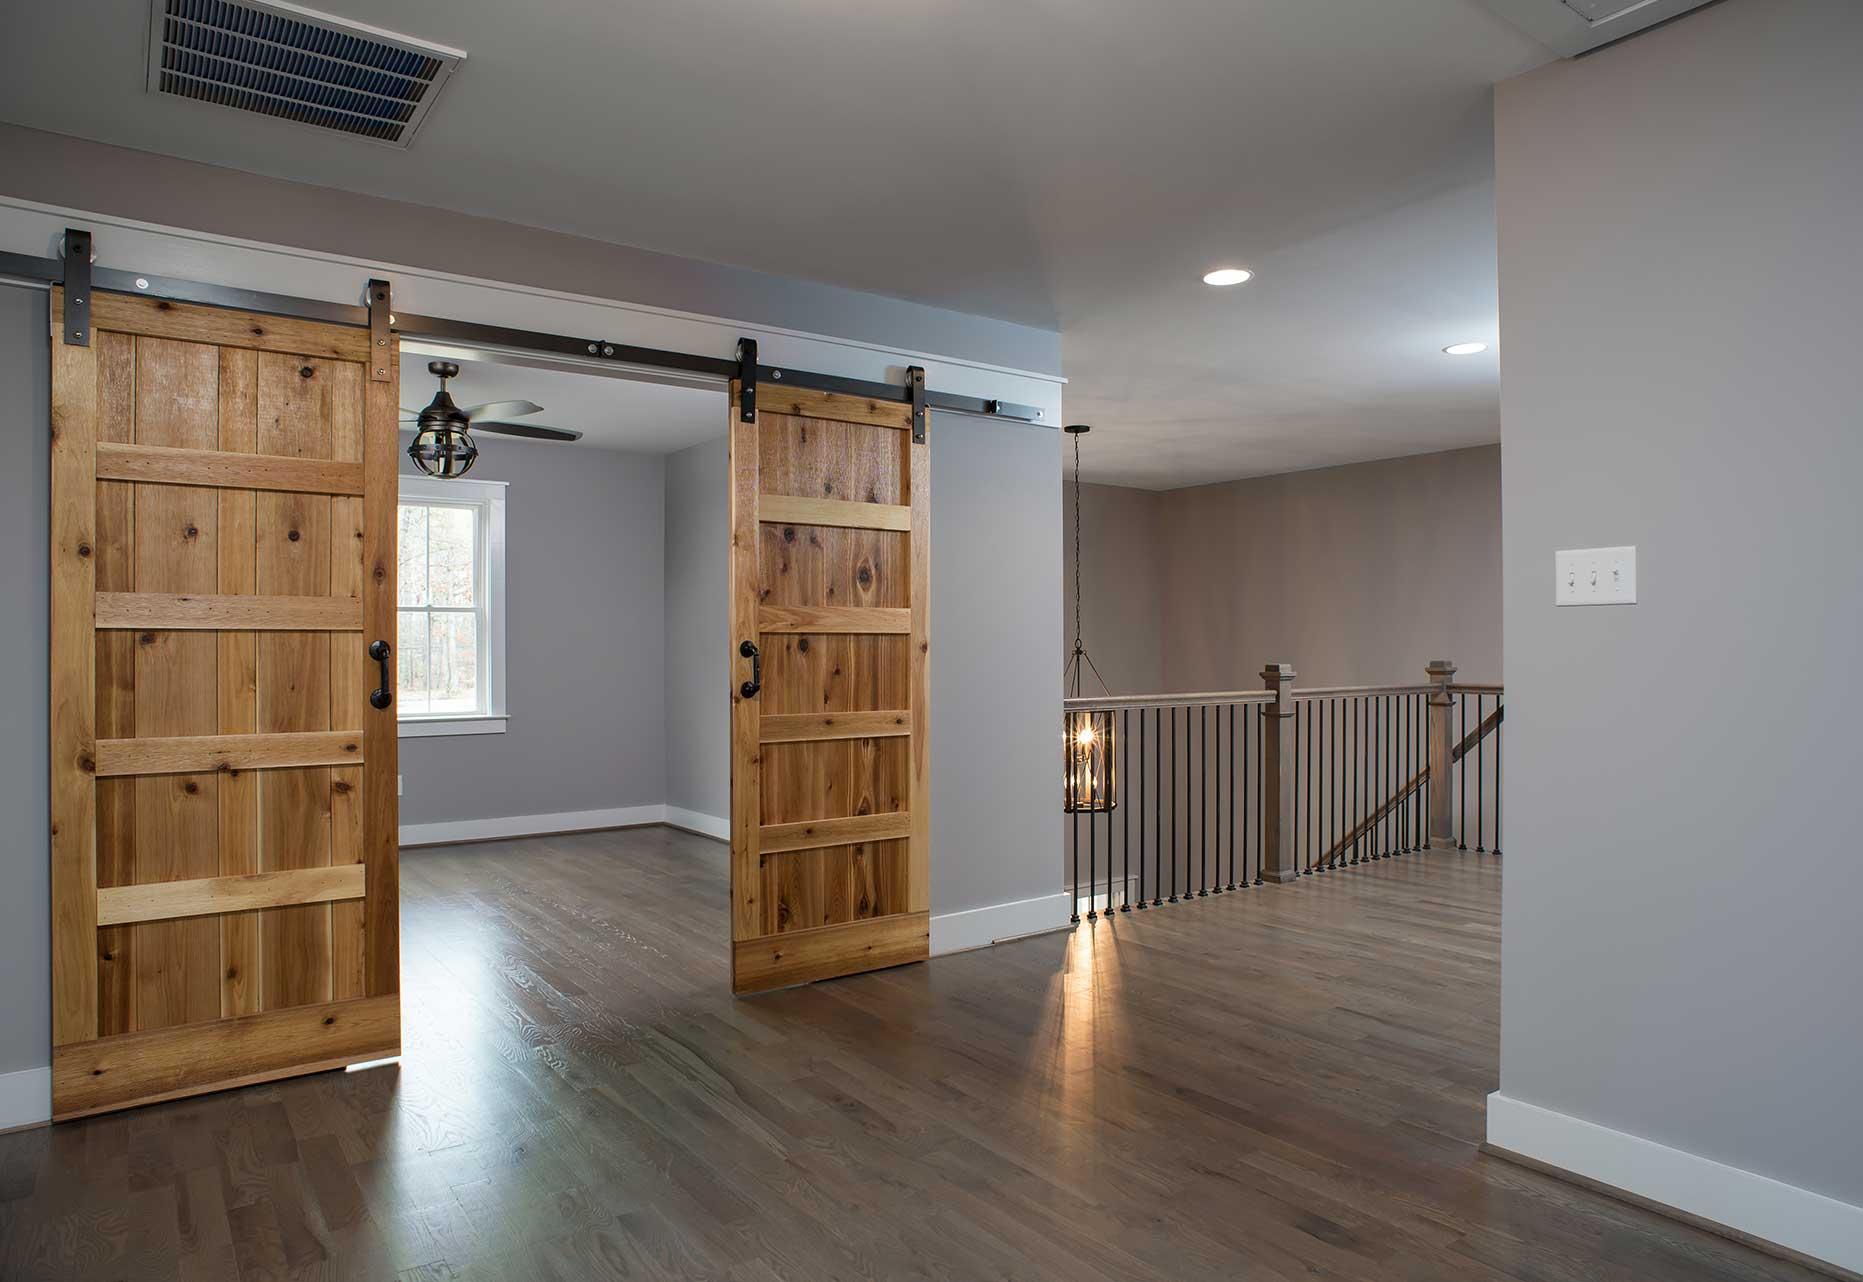 and dsc estate long designers dev virginia page richmond realtors foster va interior real